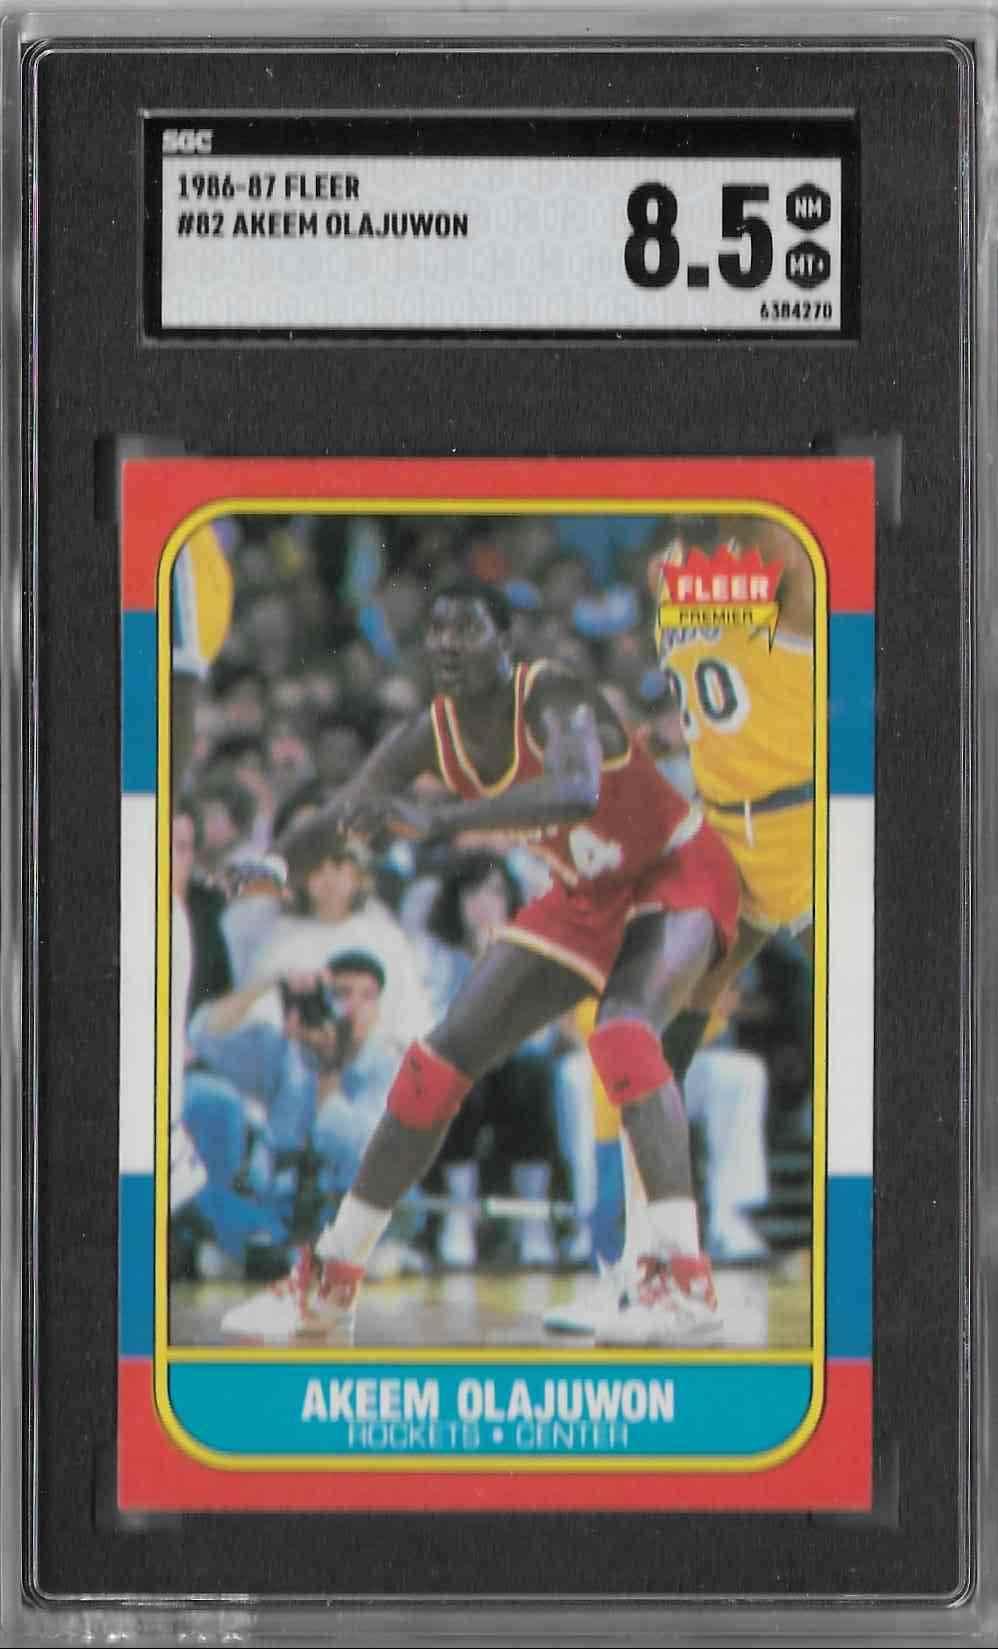 1986-87 Fleer Akeem Olajuwon #82 card front image